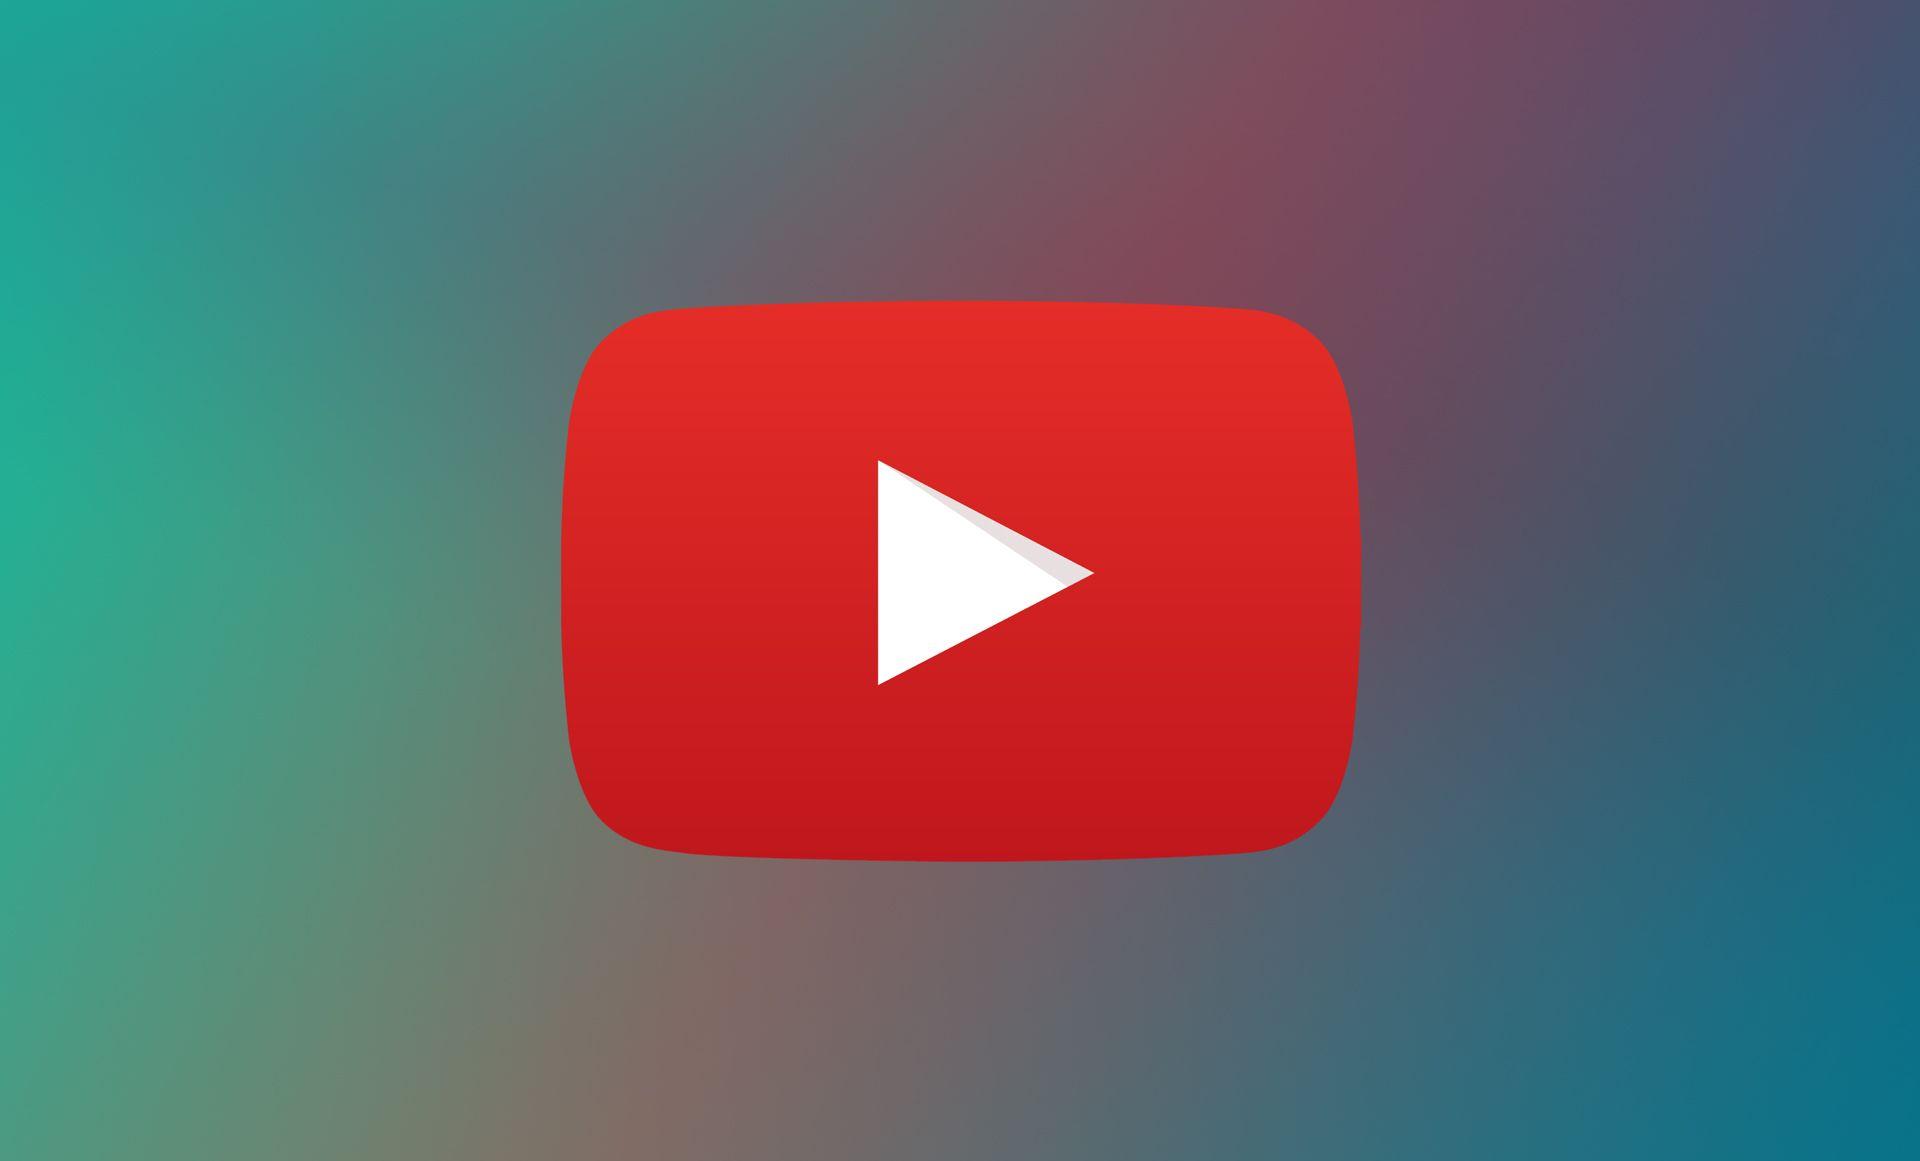 What's New: 5 Peak YouTube Videos of the Week